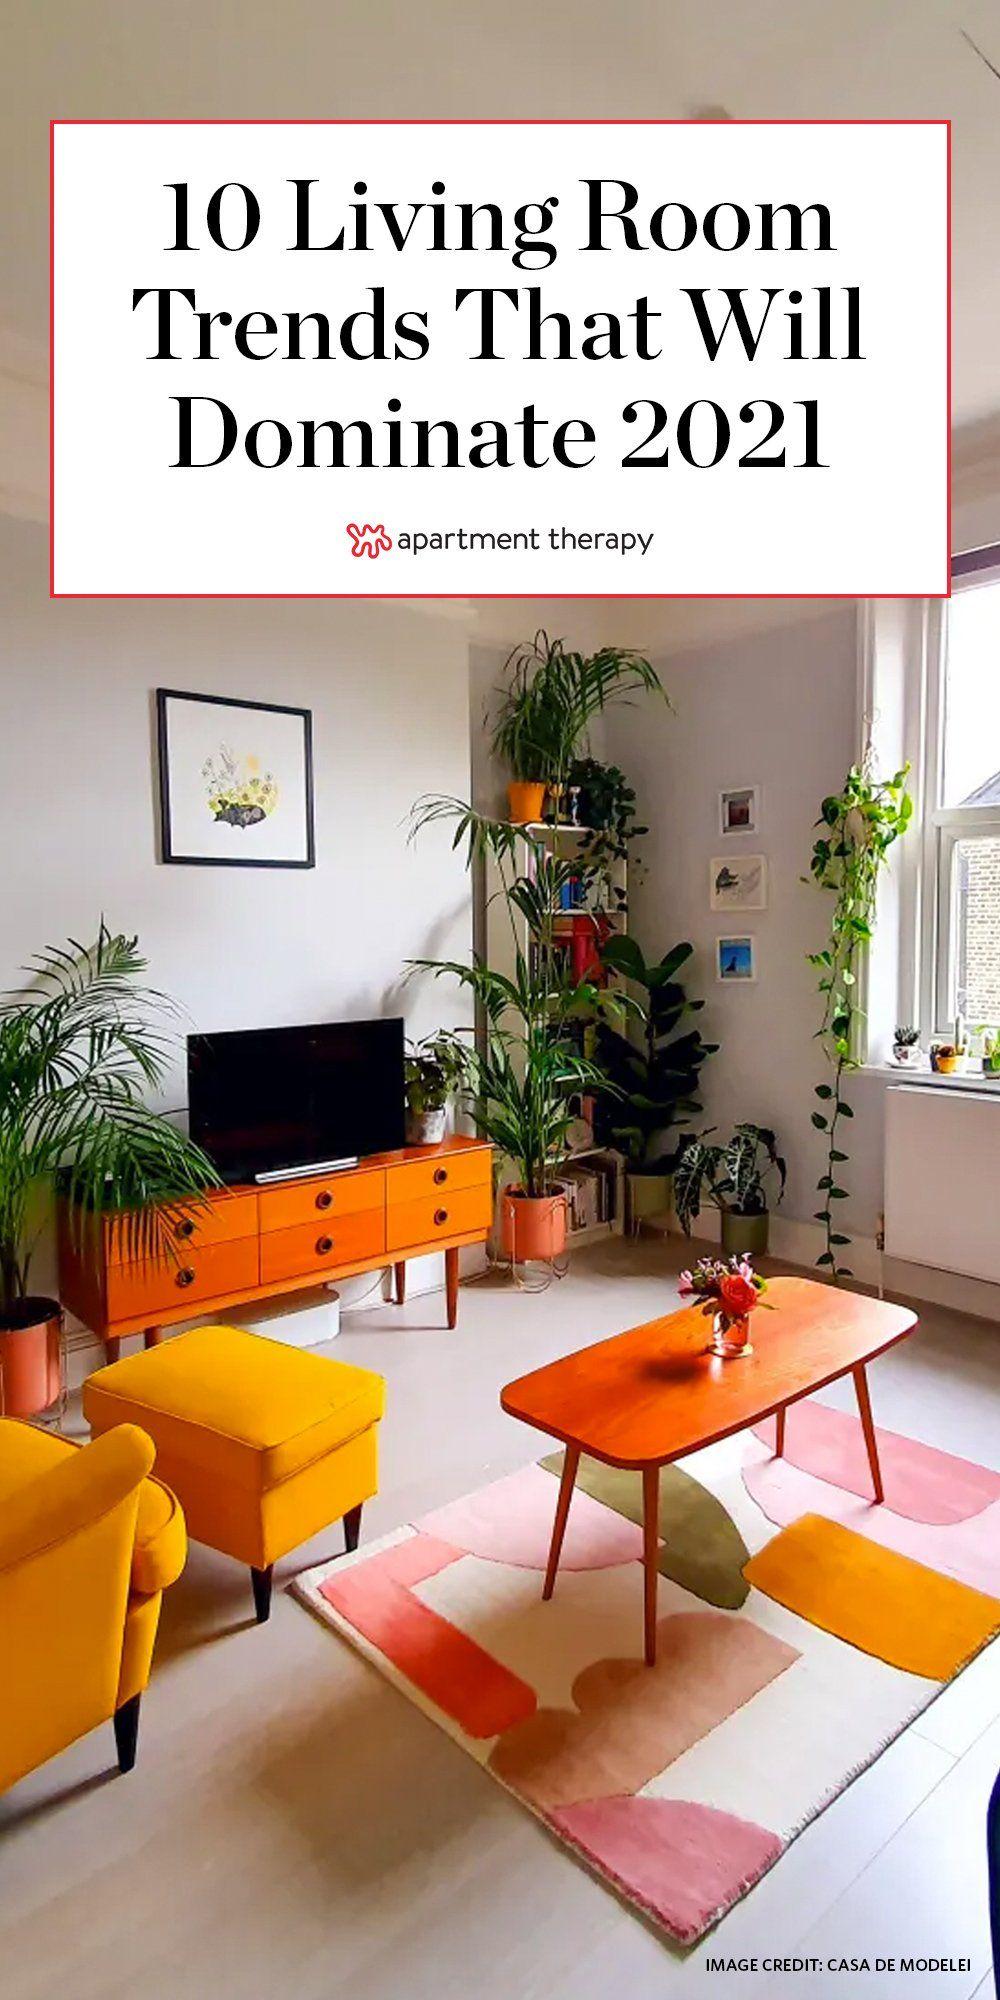 Interior Design Trends 2021 Bold Accent Furniture Green Sofa Living Room Home Design Living Room Green Sofa Living